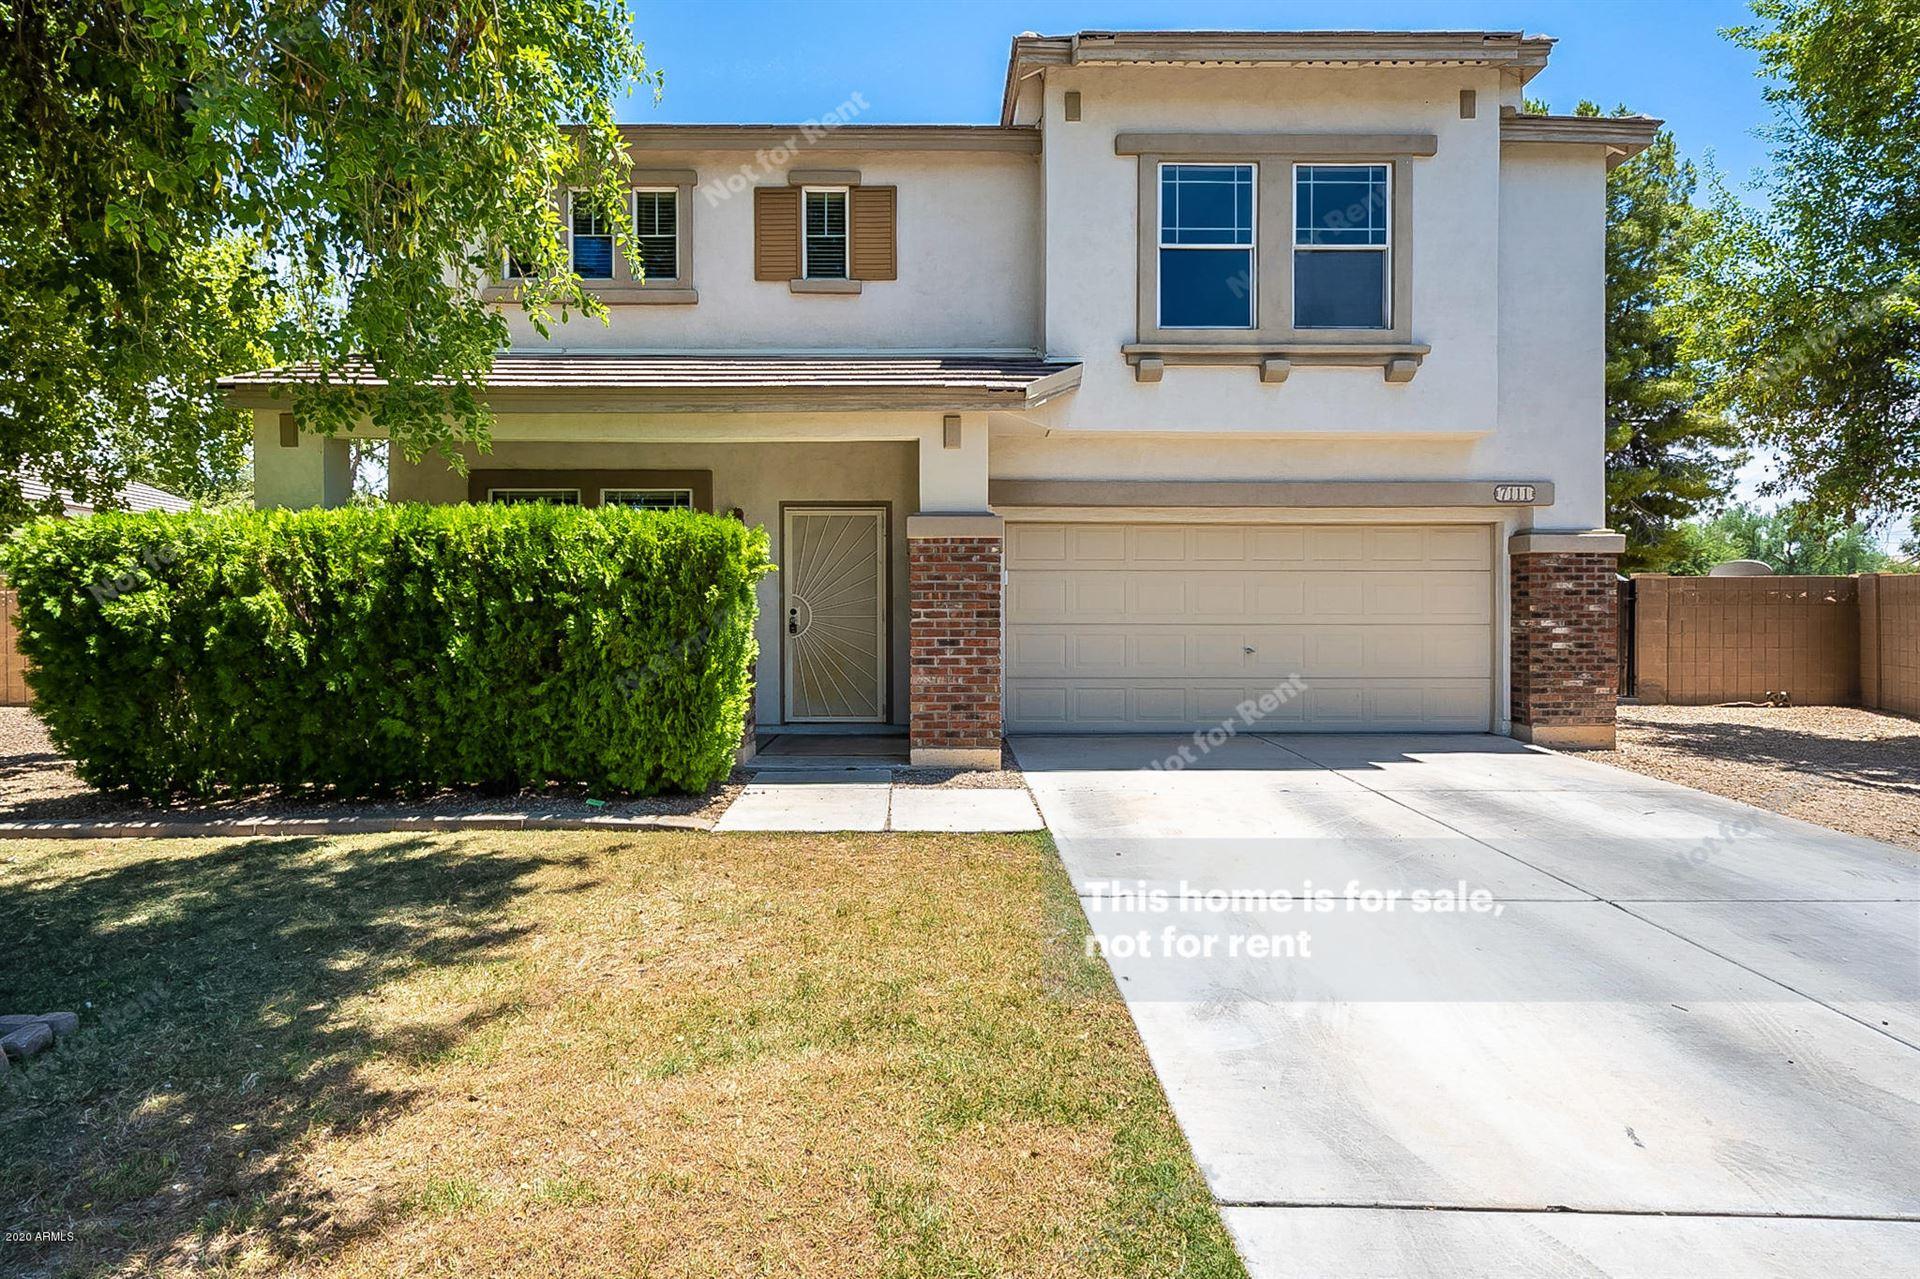 7111 N 72ND Avenue, Glendale, AZ 85303 - #: 6107160